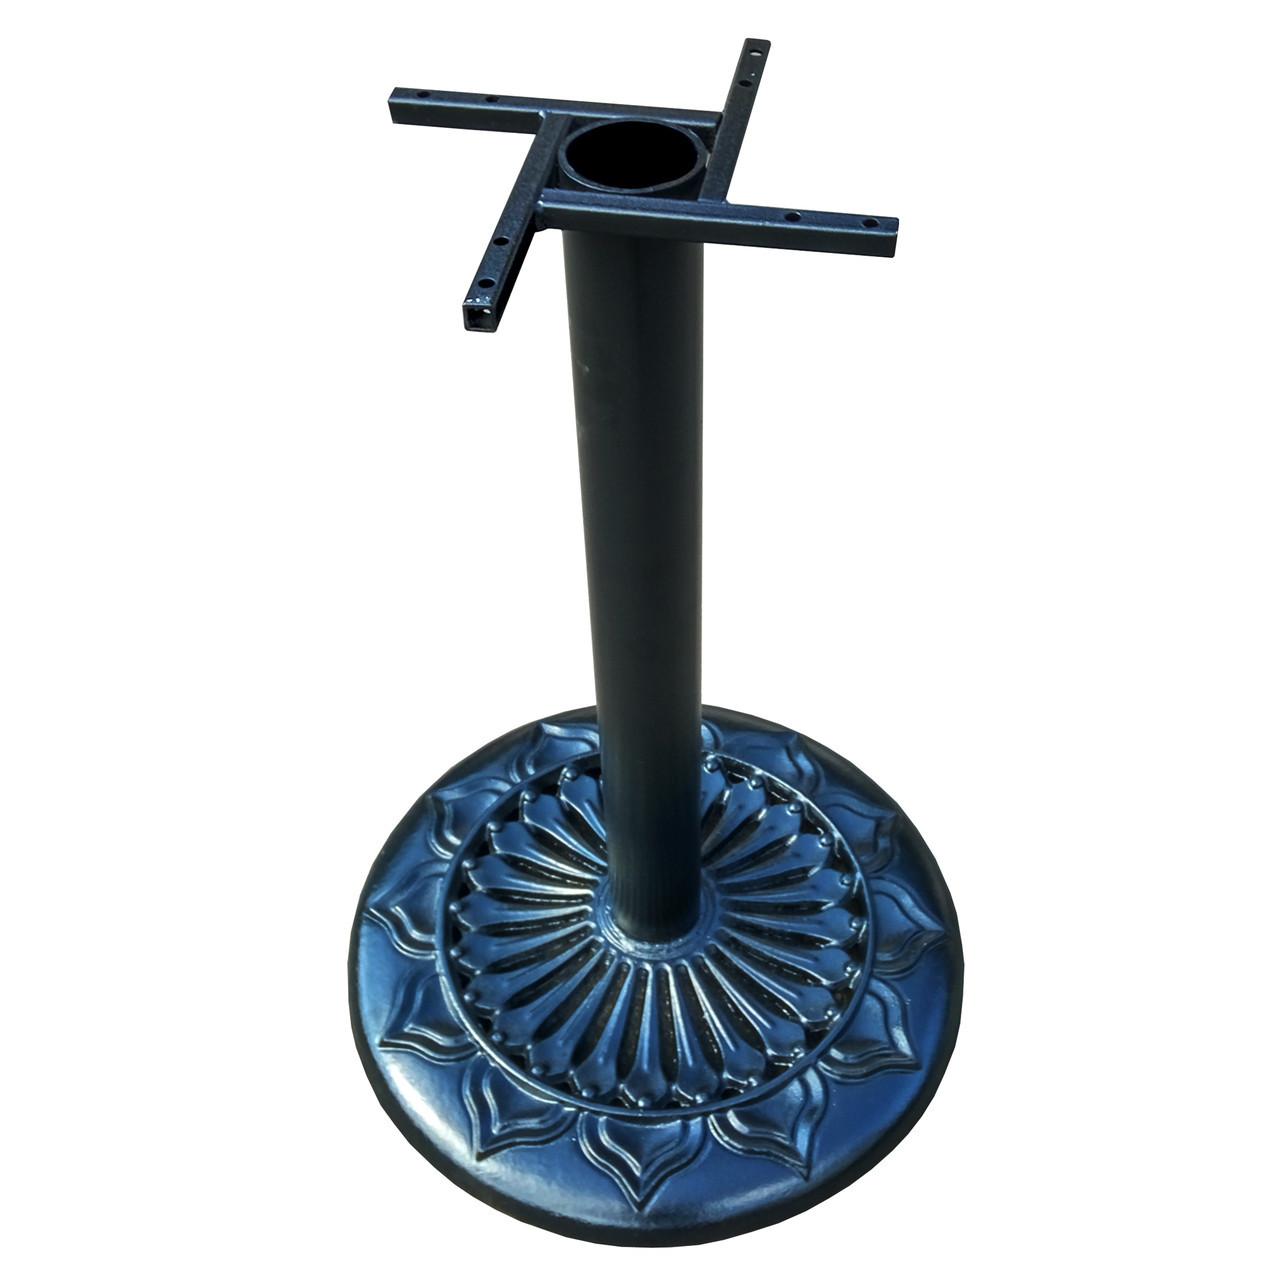 Опора для стола Сполето. Основание для стола. Подстолье из чугуна. Основа для стола. База для стола.